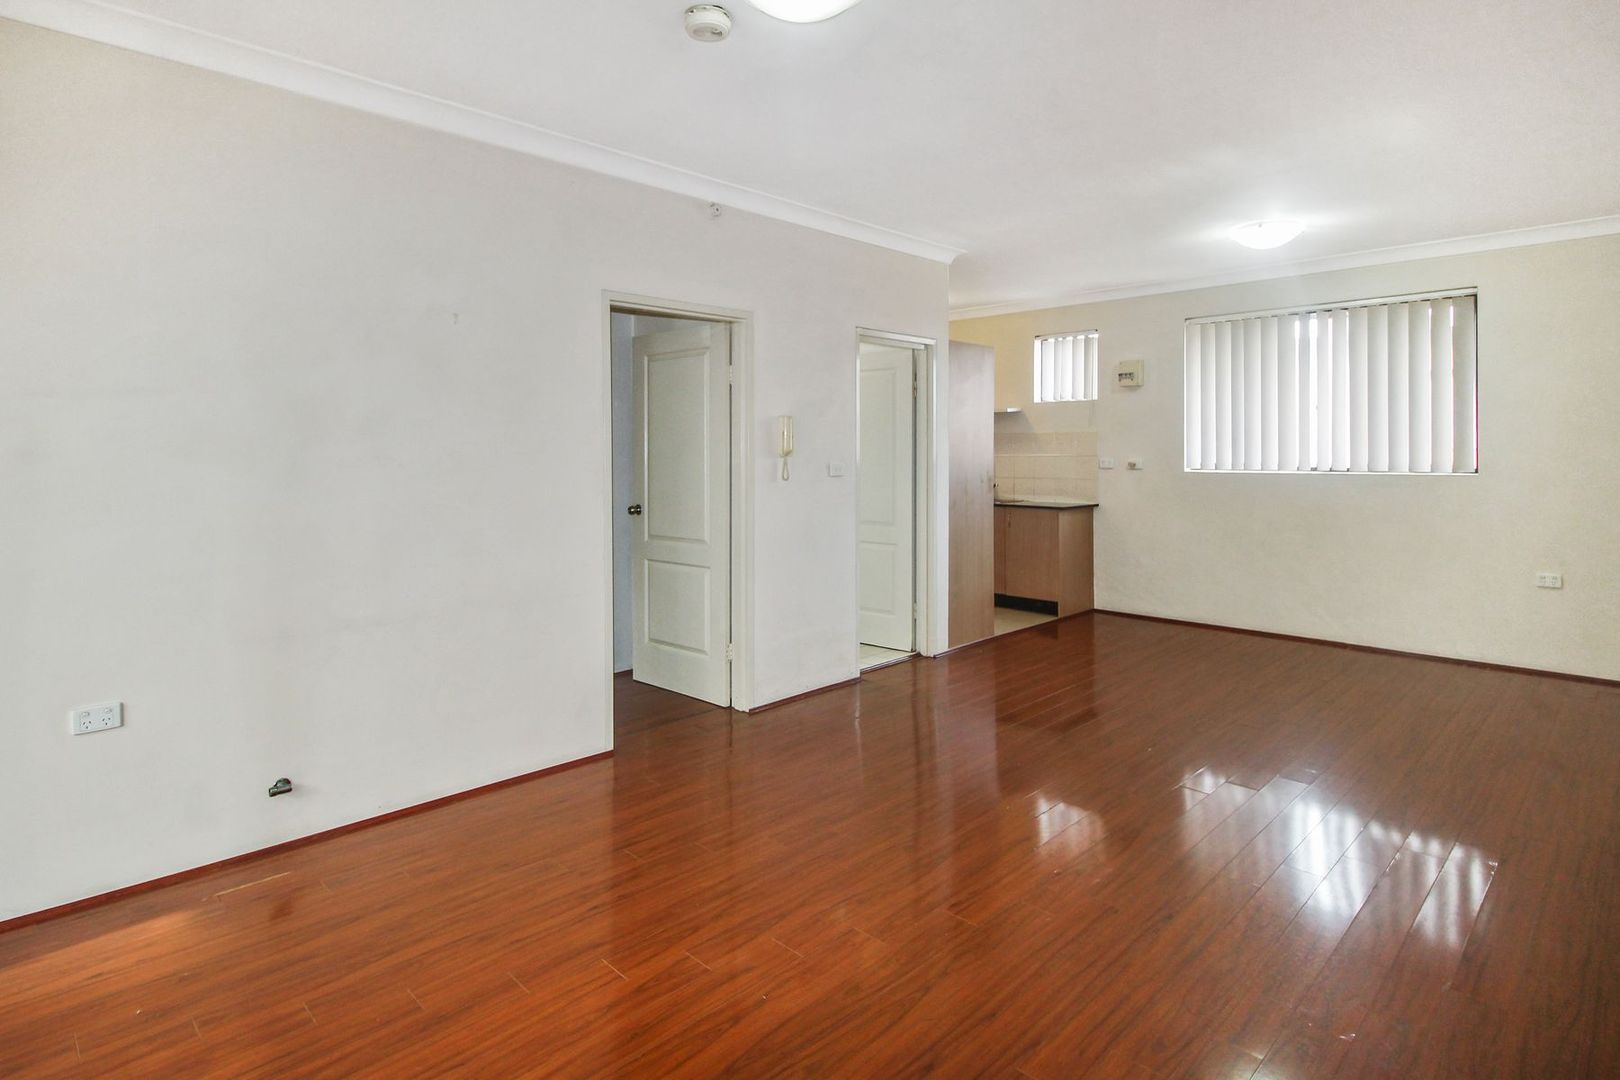 16/43 Bowden Street, Harris Park NSW 2150, Image 1